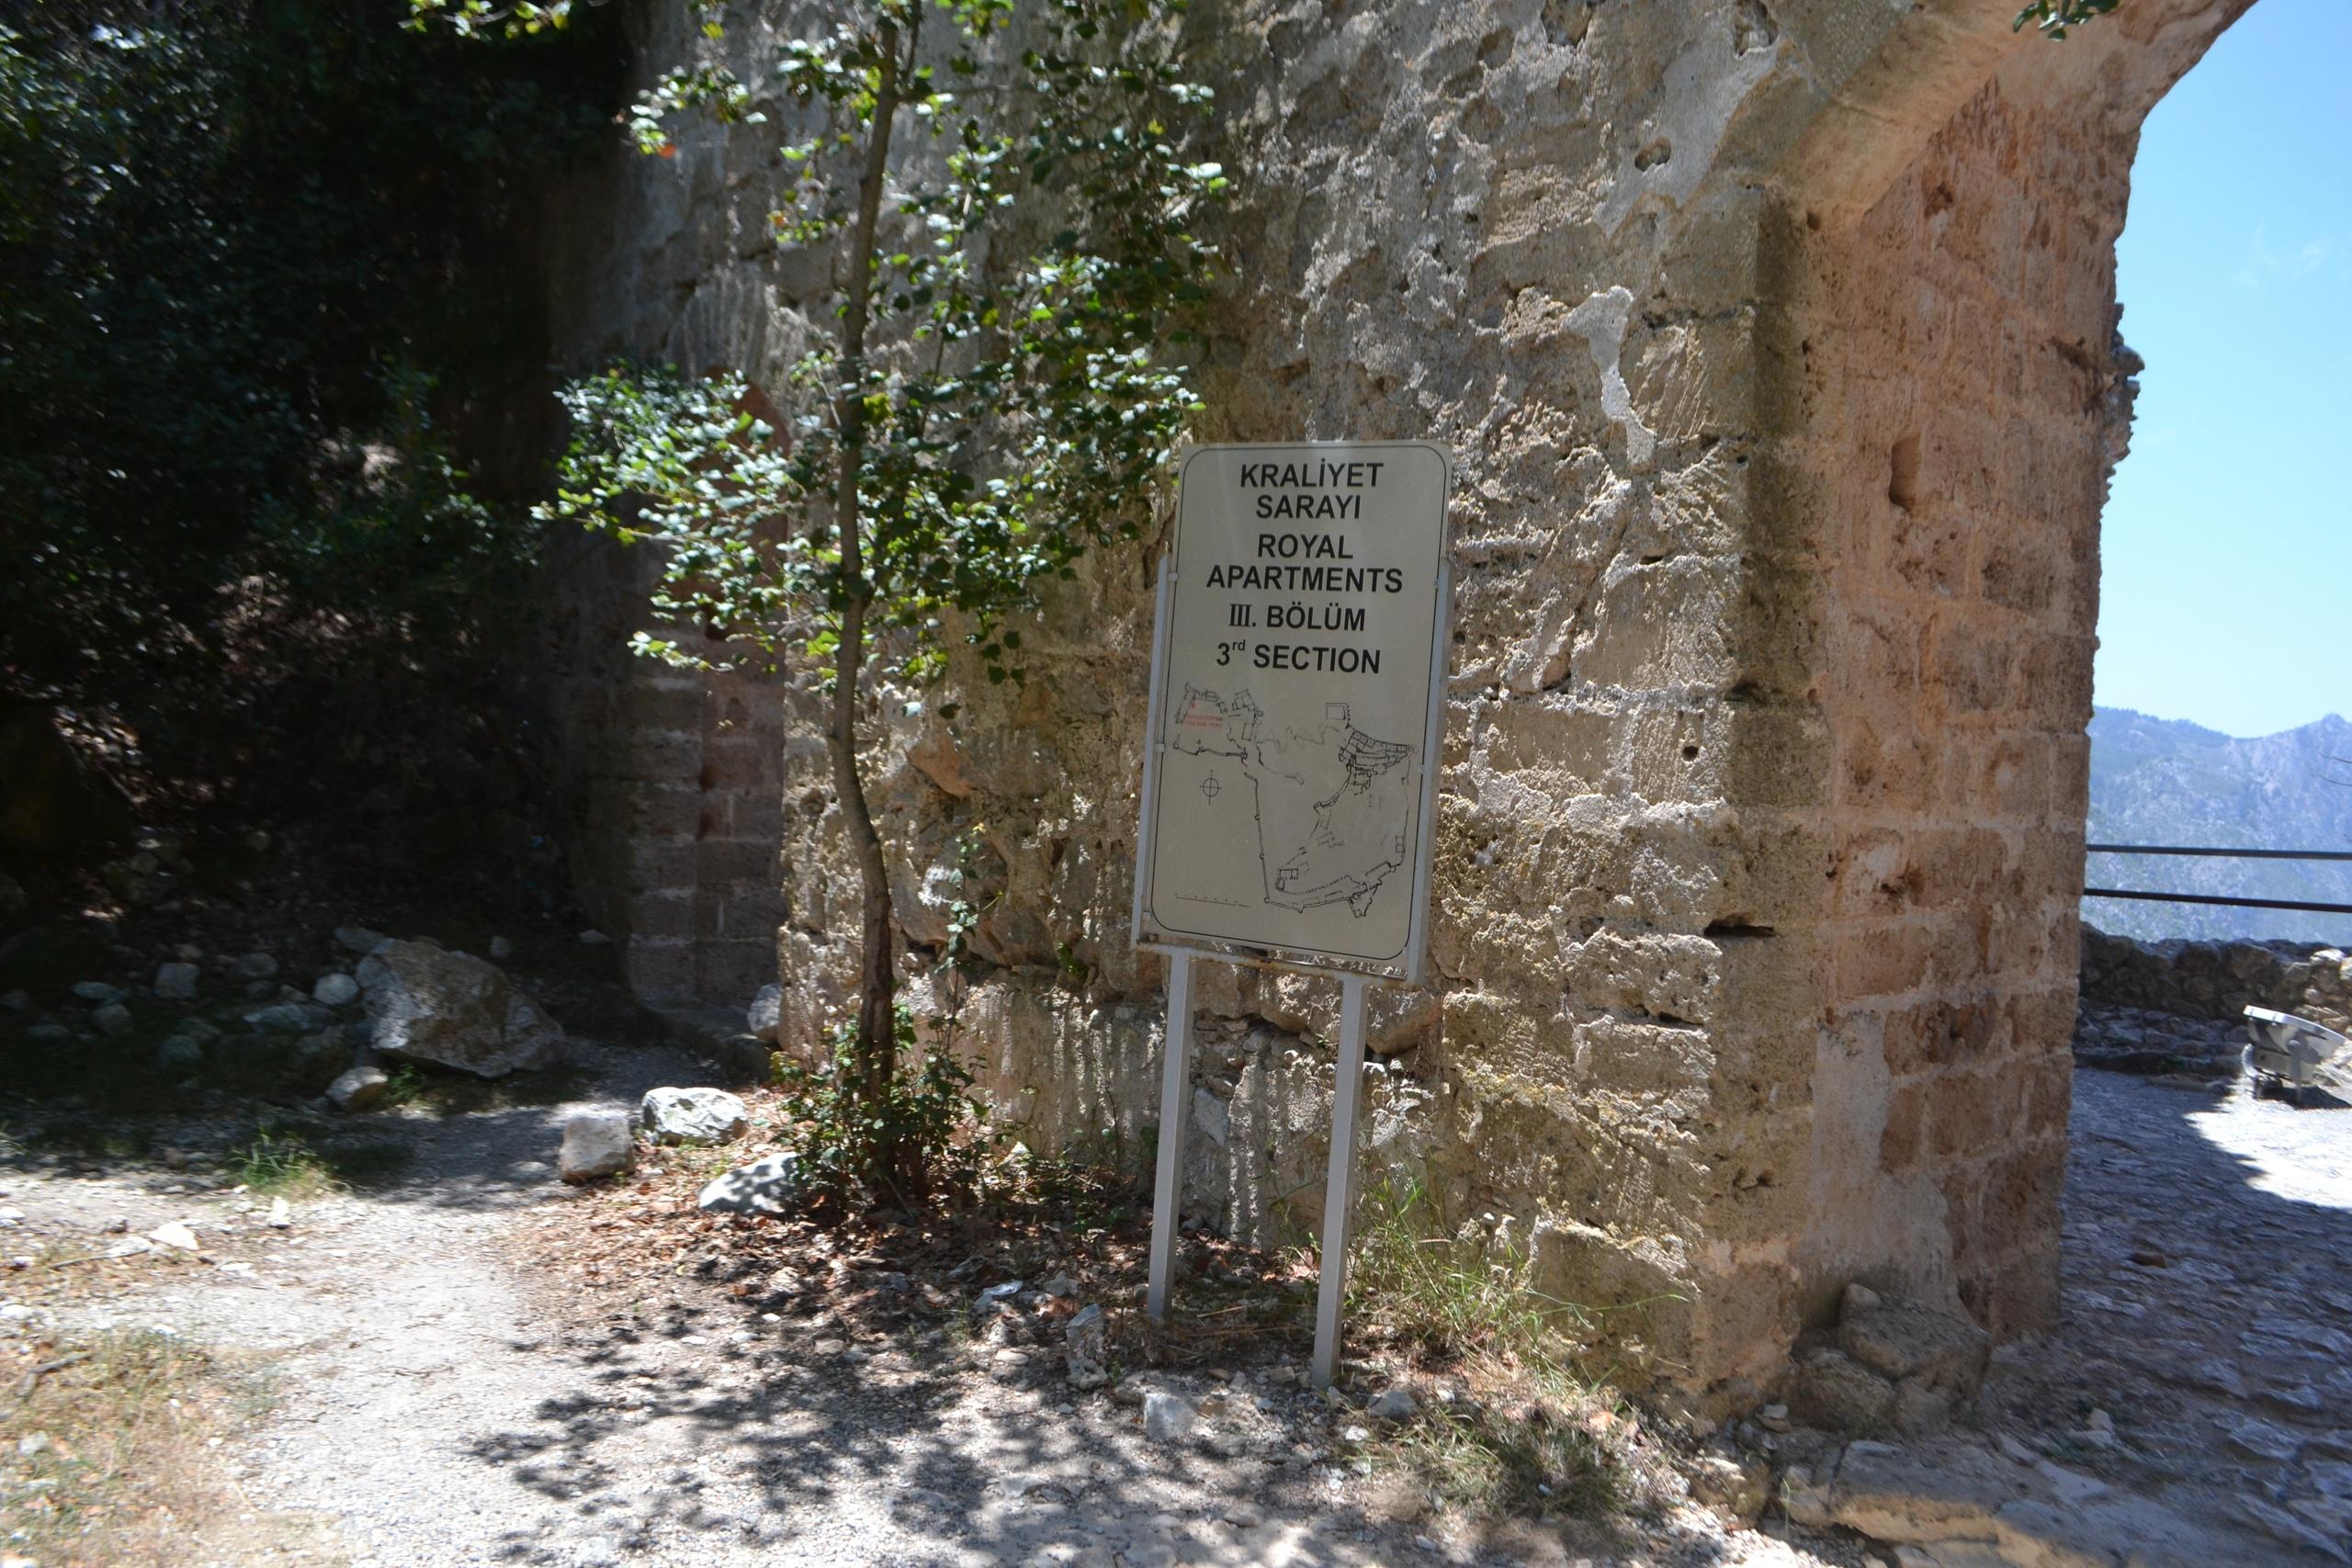 Северный Кипр. Замок Святого Иллариона. (фото). - Страница 3 BhWIWqexKXU